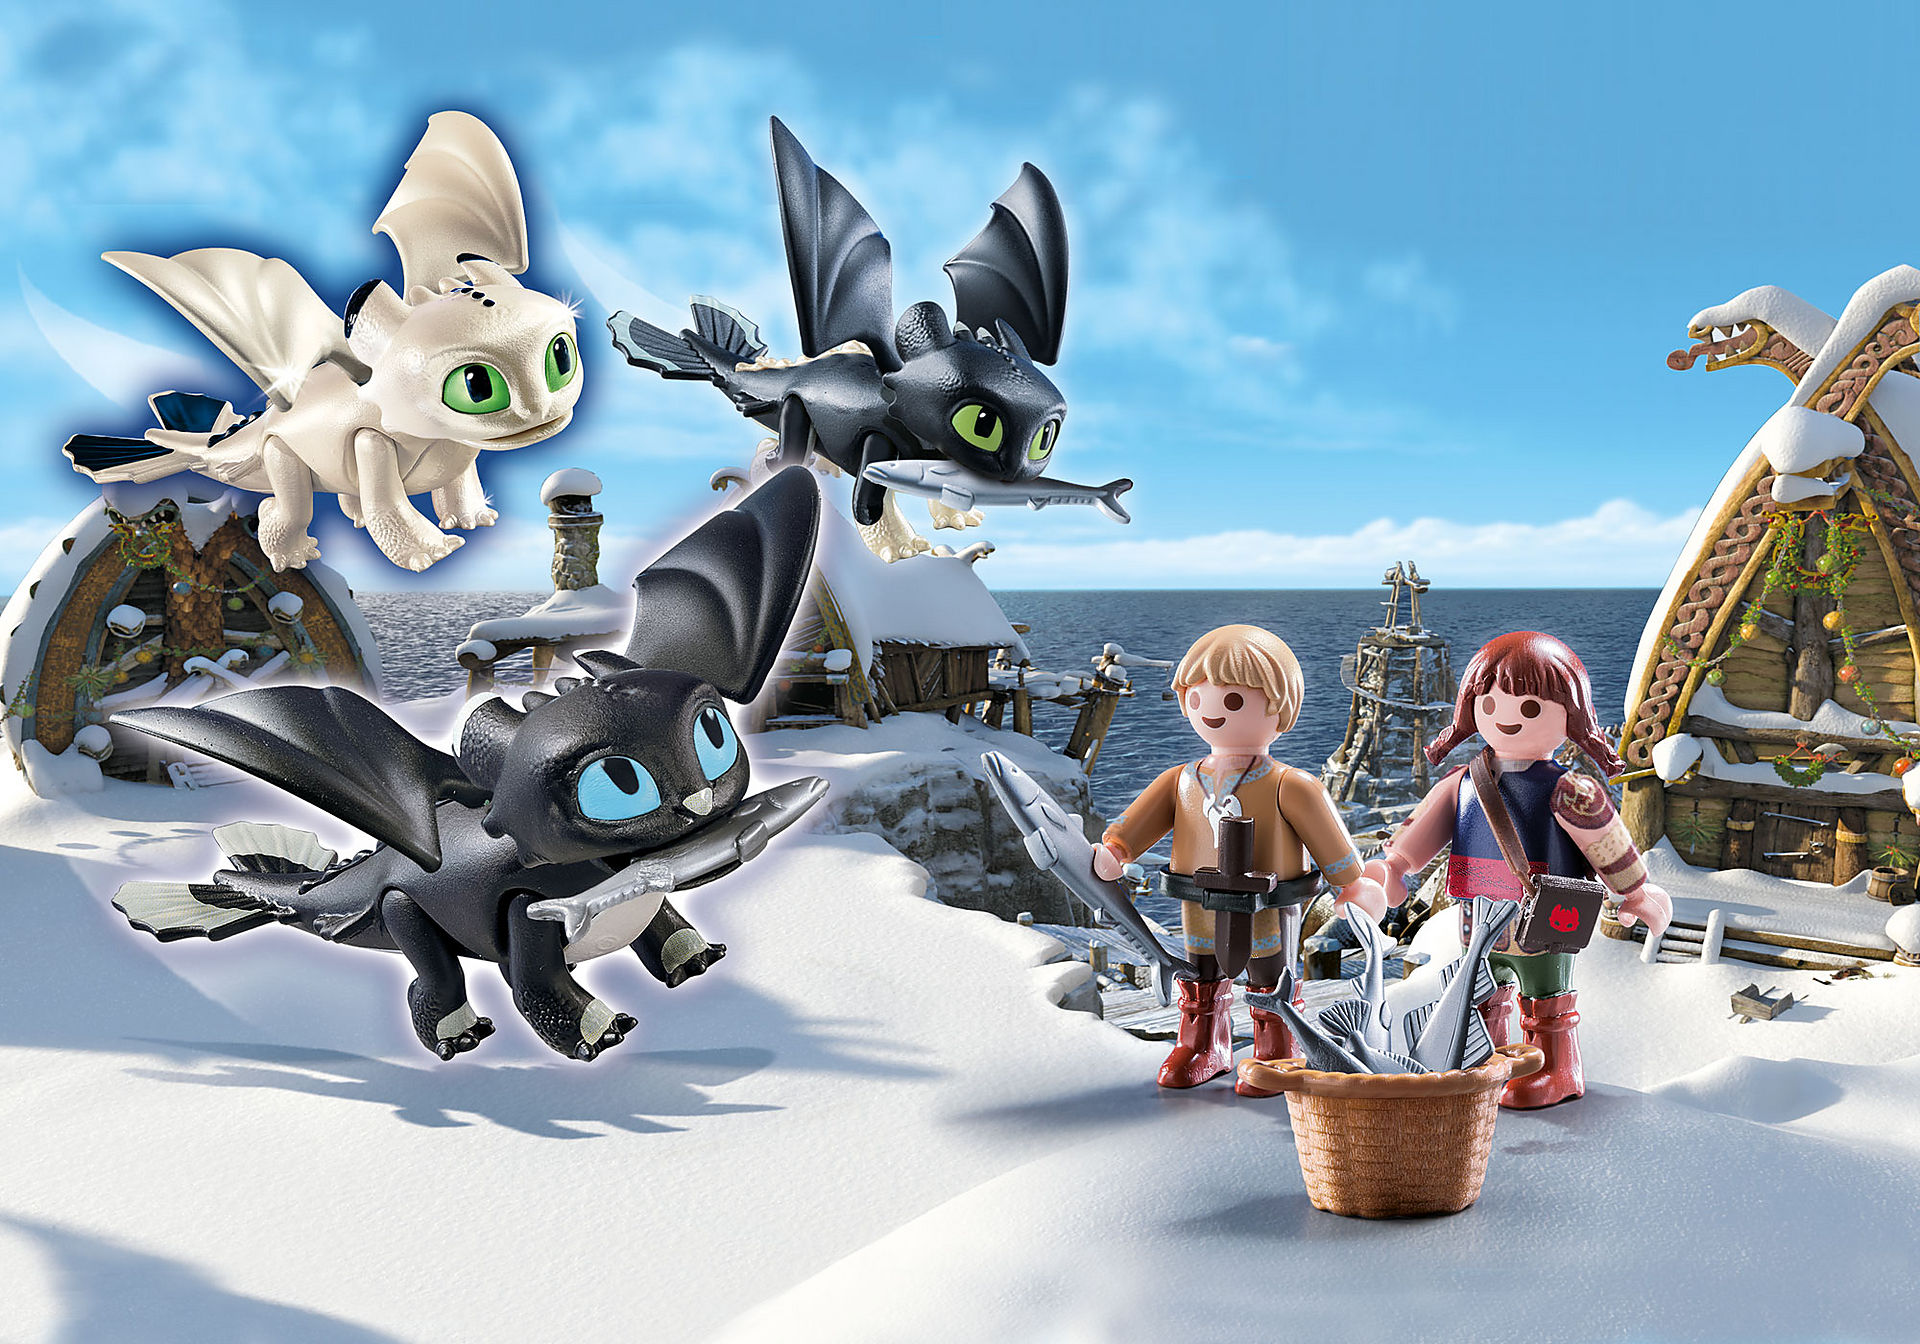 http://media.playmobil.com/i/playmobil/70457_product_detail/Bébés dragons avec enfants